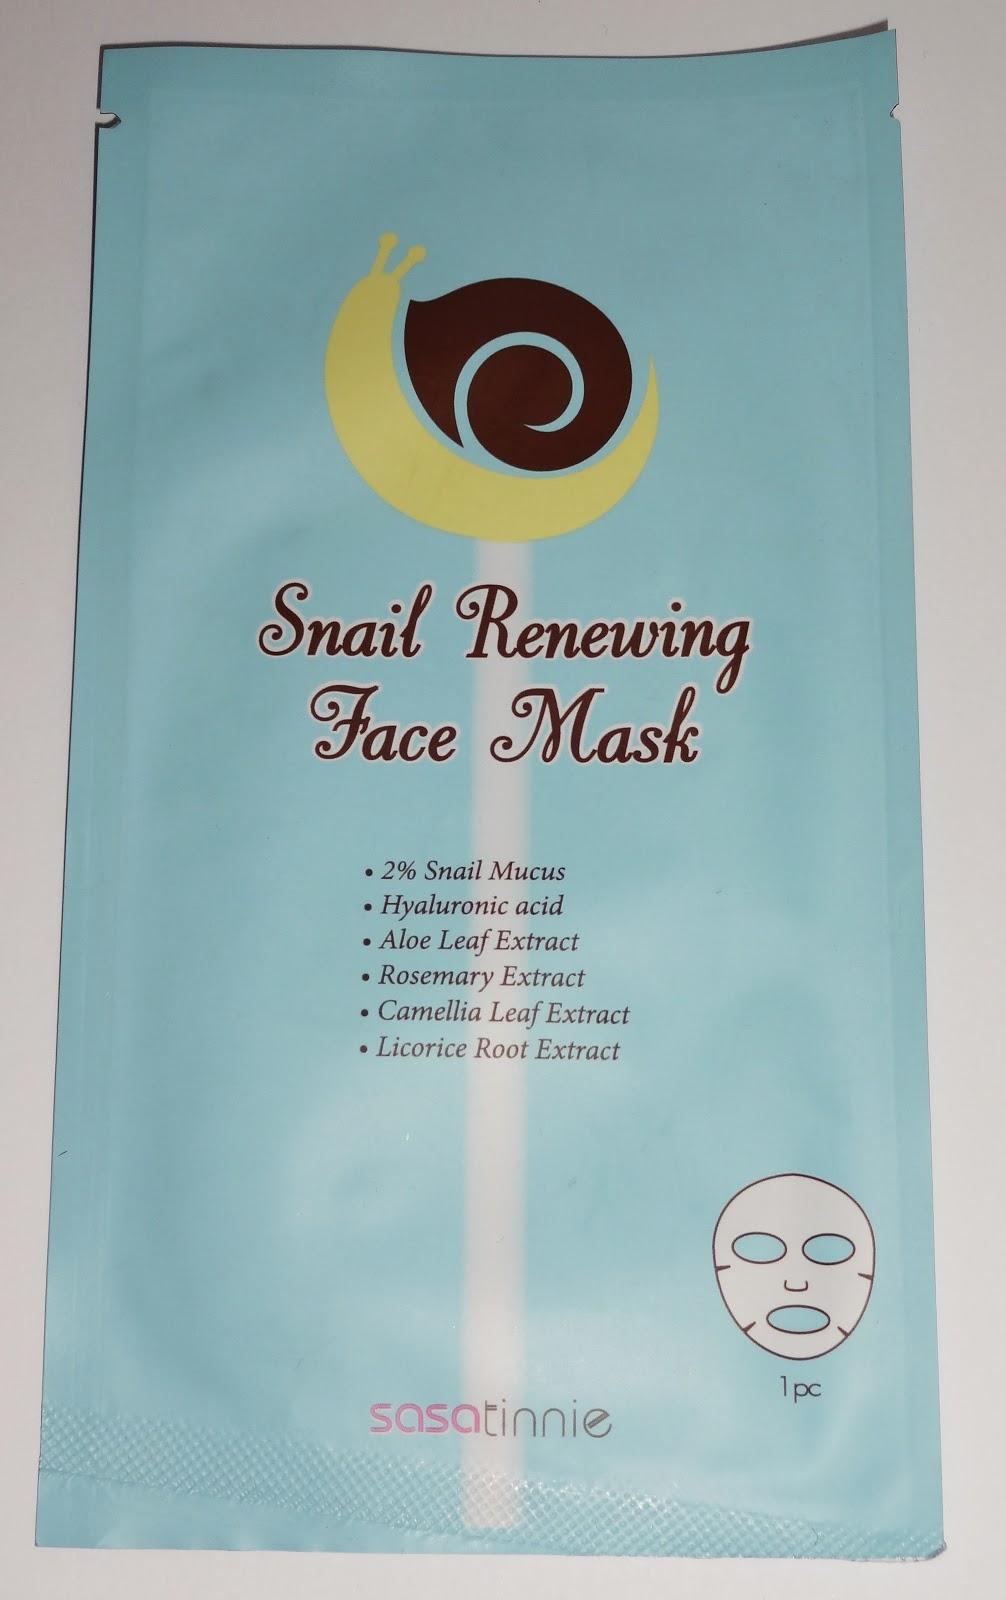 Sasatinnie - Snail Renewing Face Mask